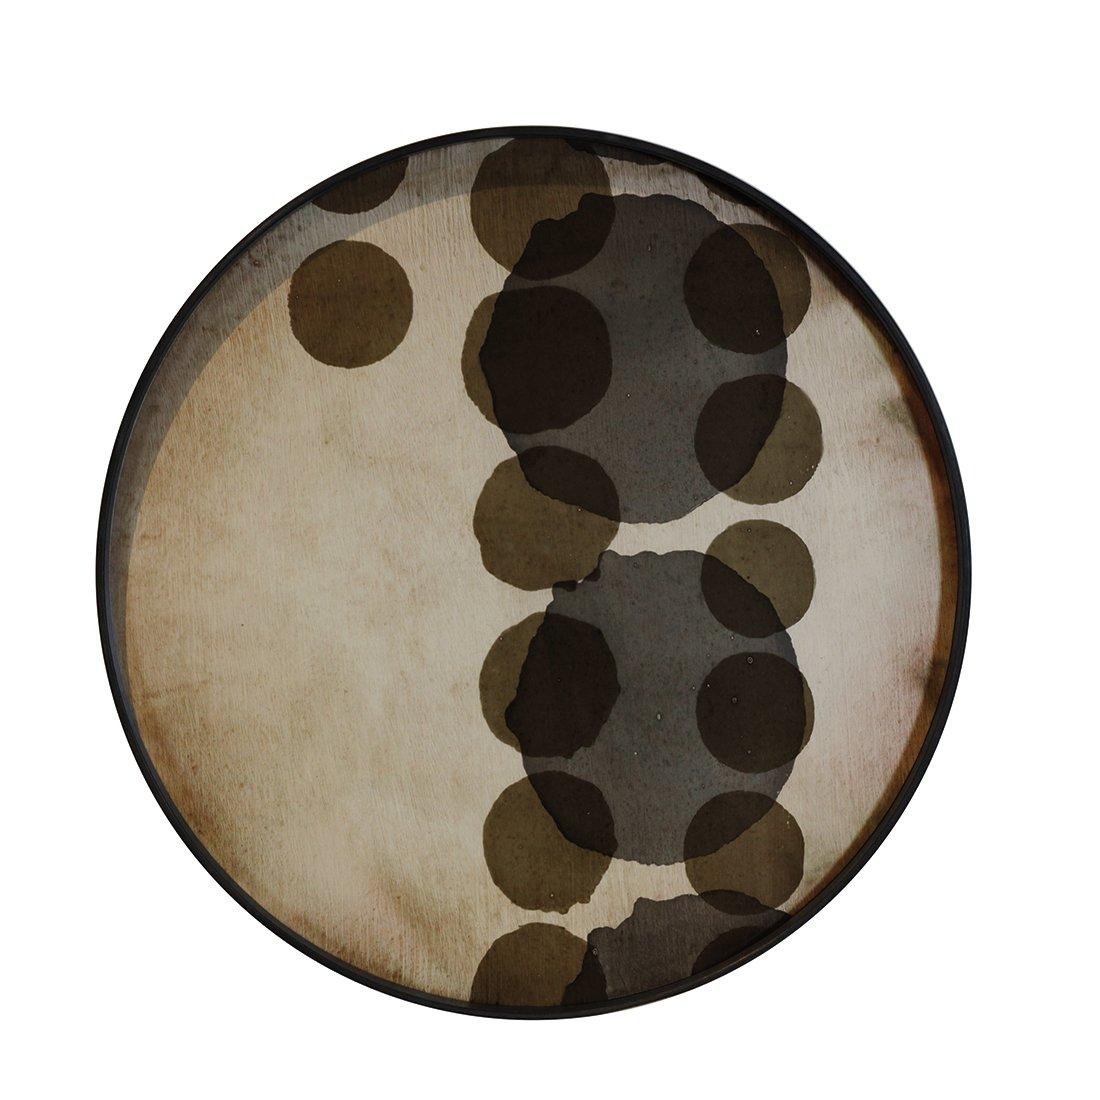 Ethnicraft Slayed Layered Dots Dienblad